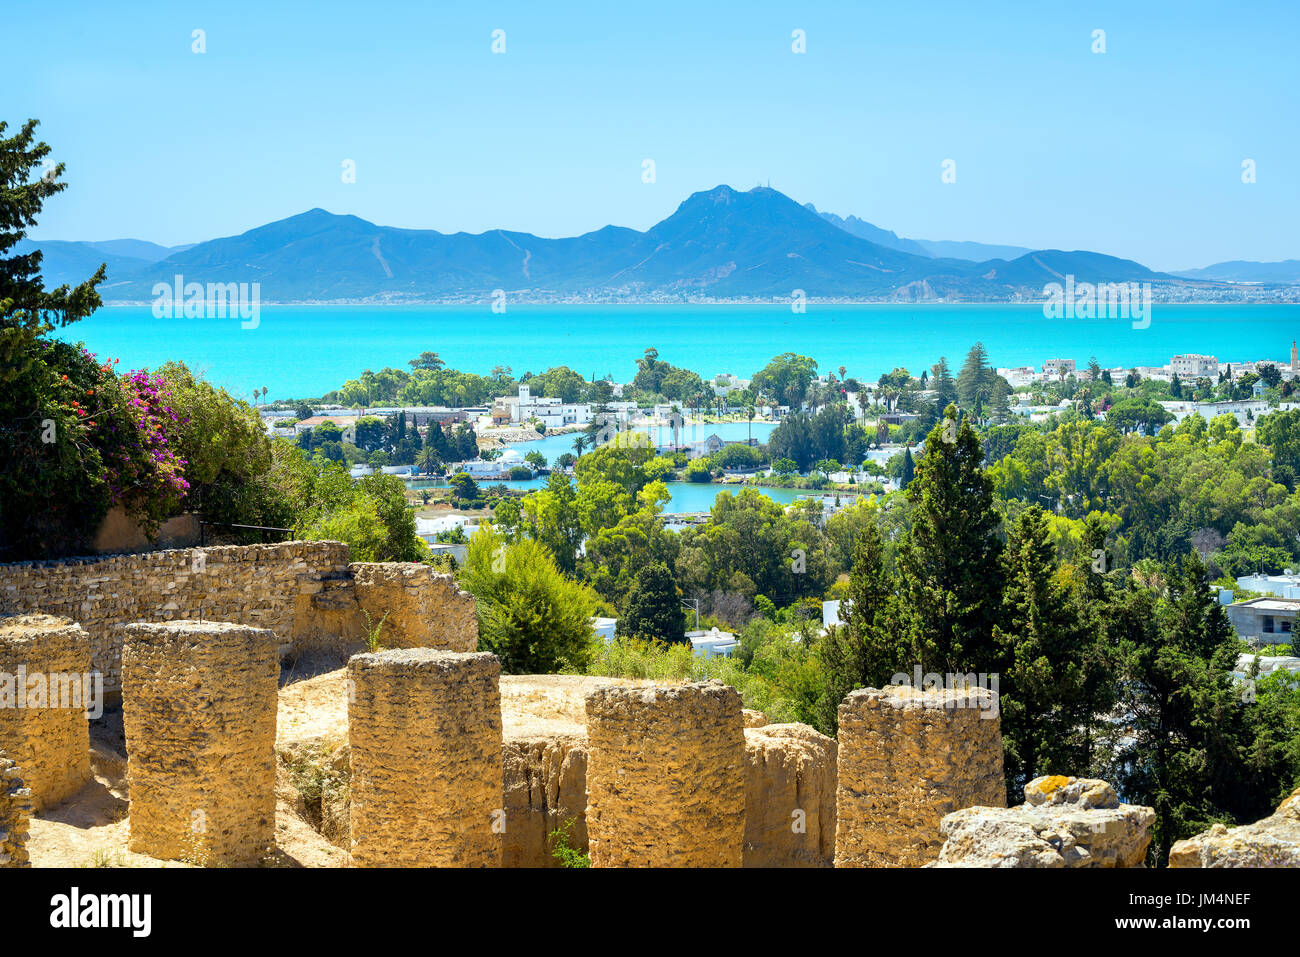 Paysage avec ruines antiques de Carthage. Tunis, Tunisie, Afrique Photo Stock